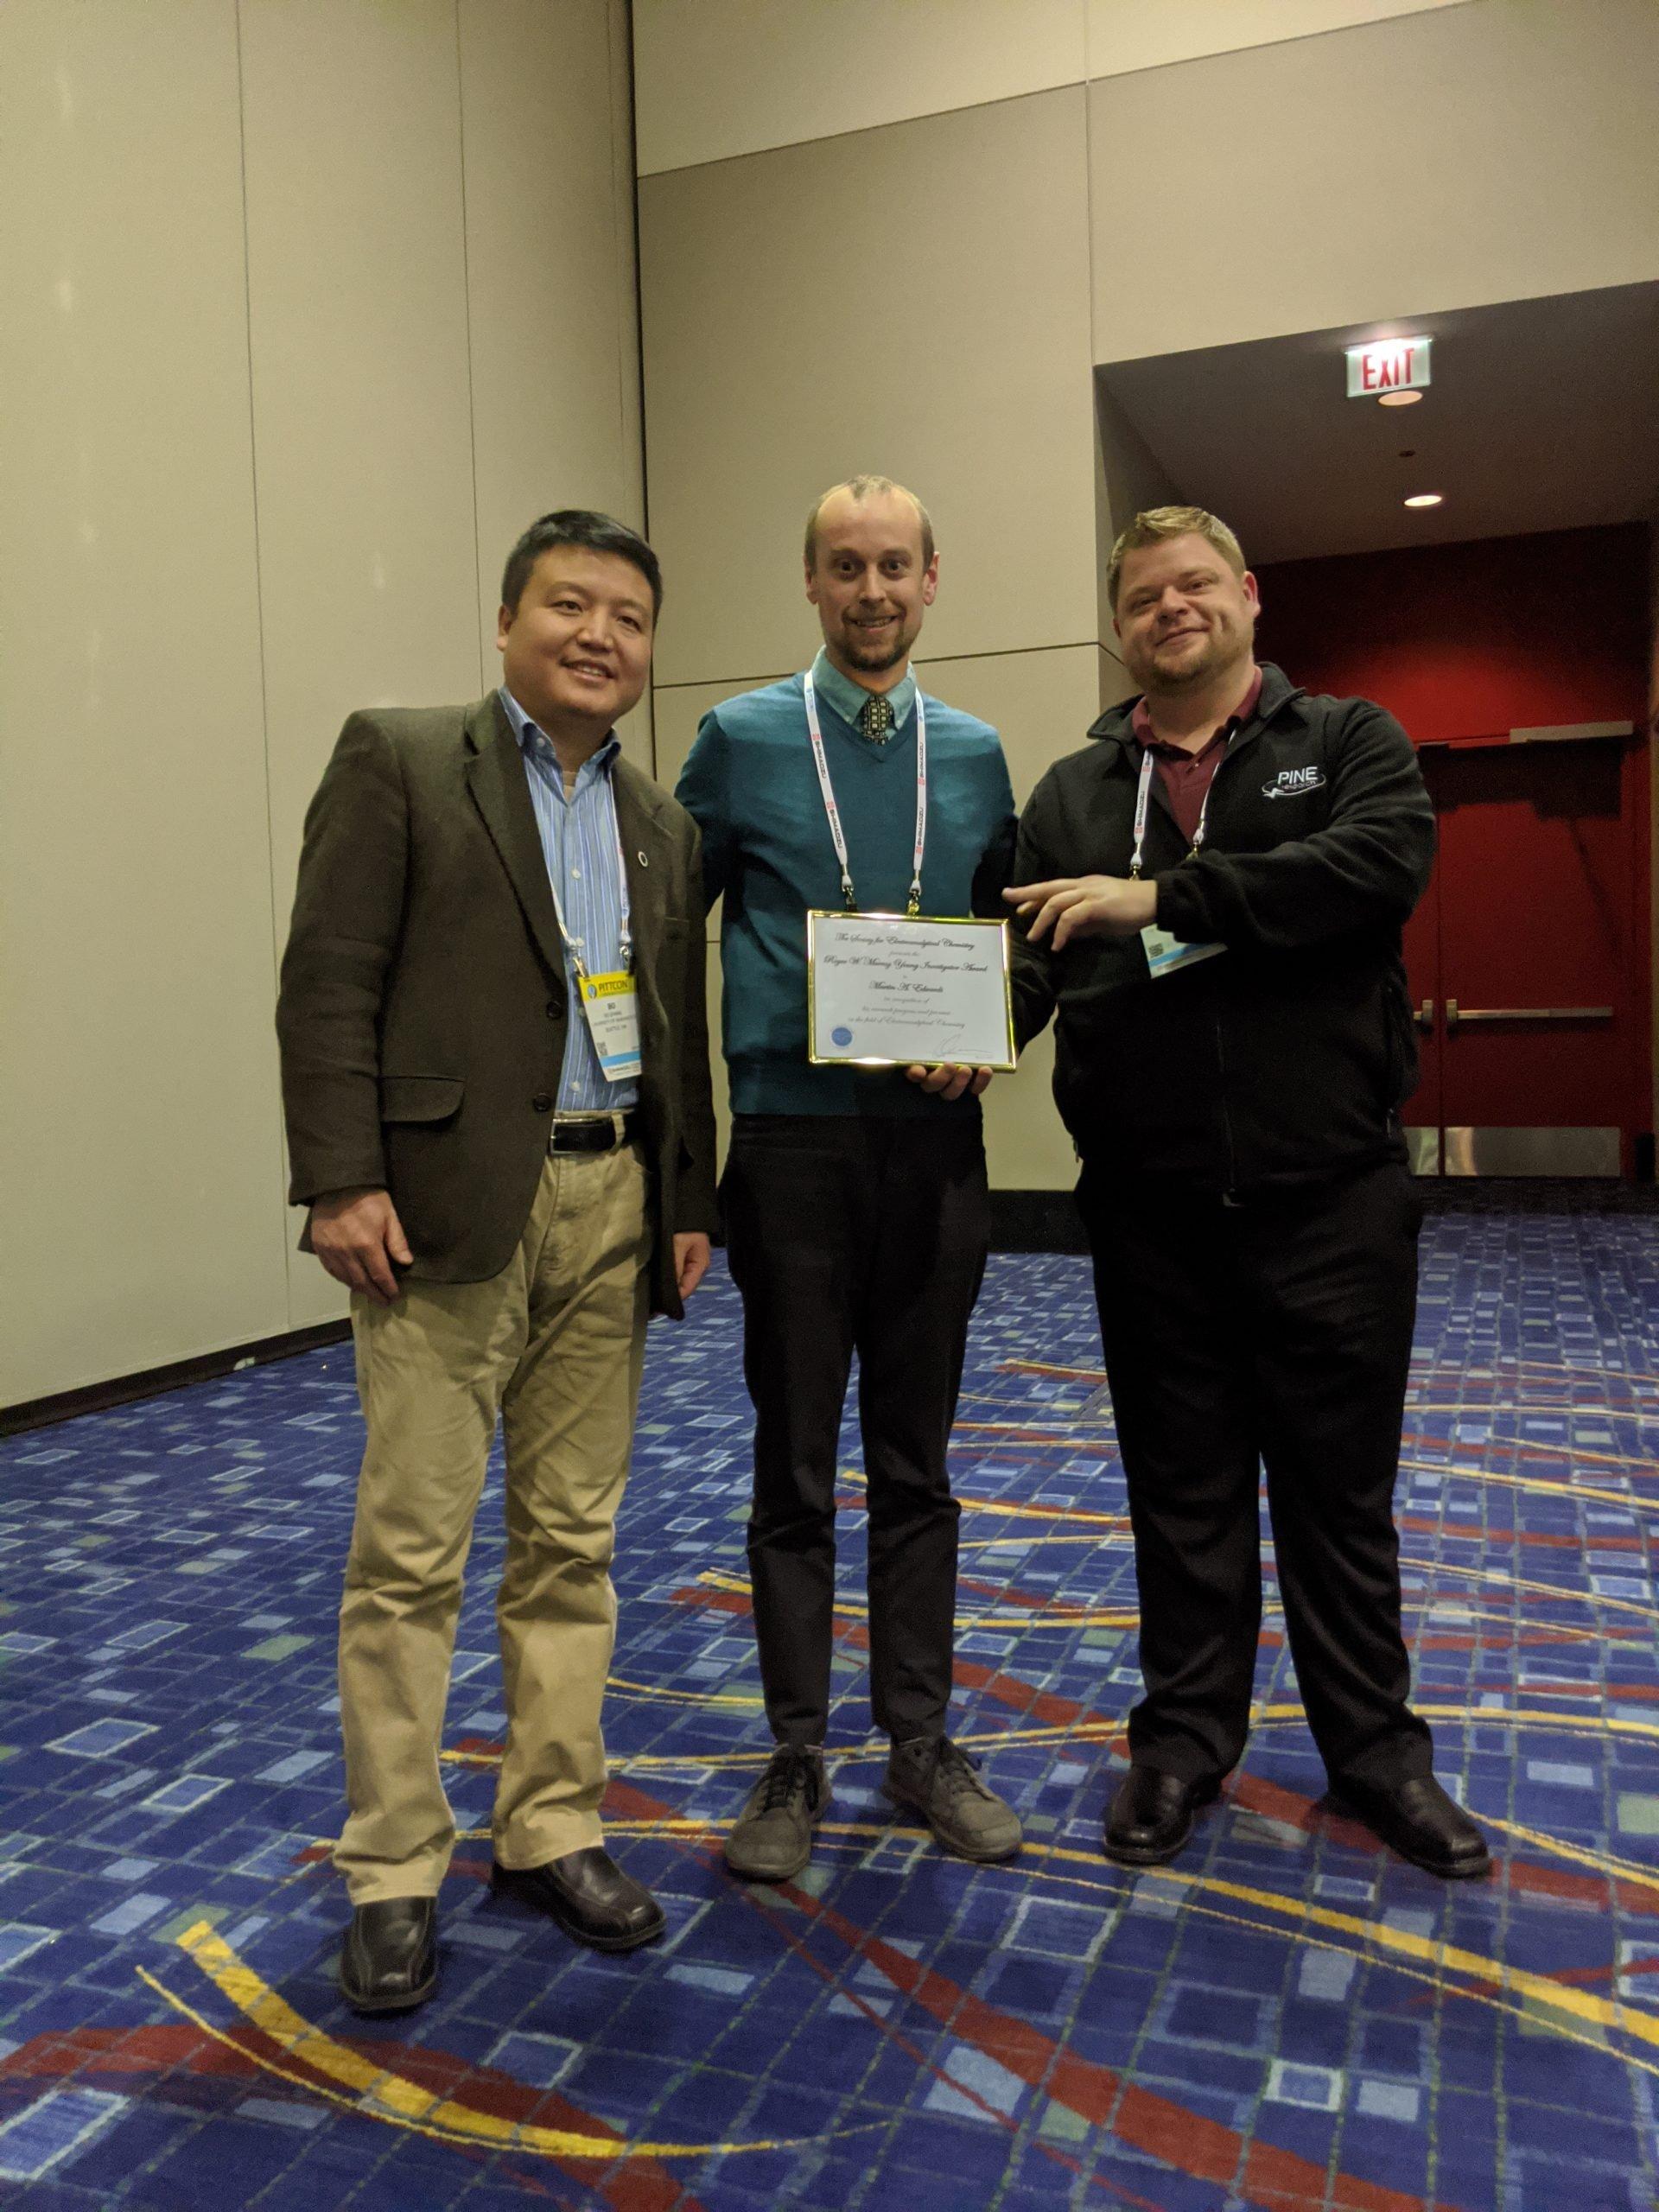 SEAC Award Symposium at Pittcon 2020 (Chicago, IL) – 5